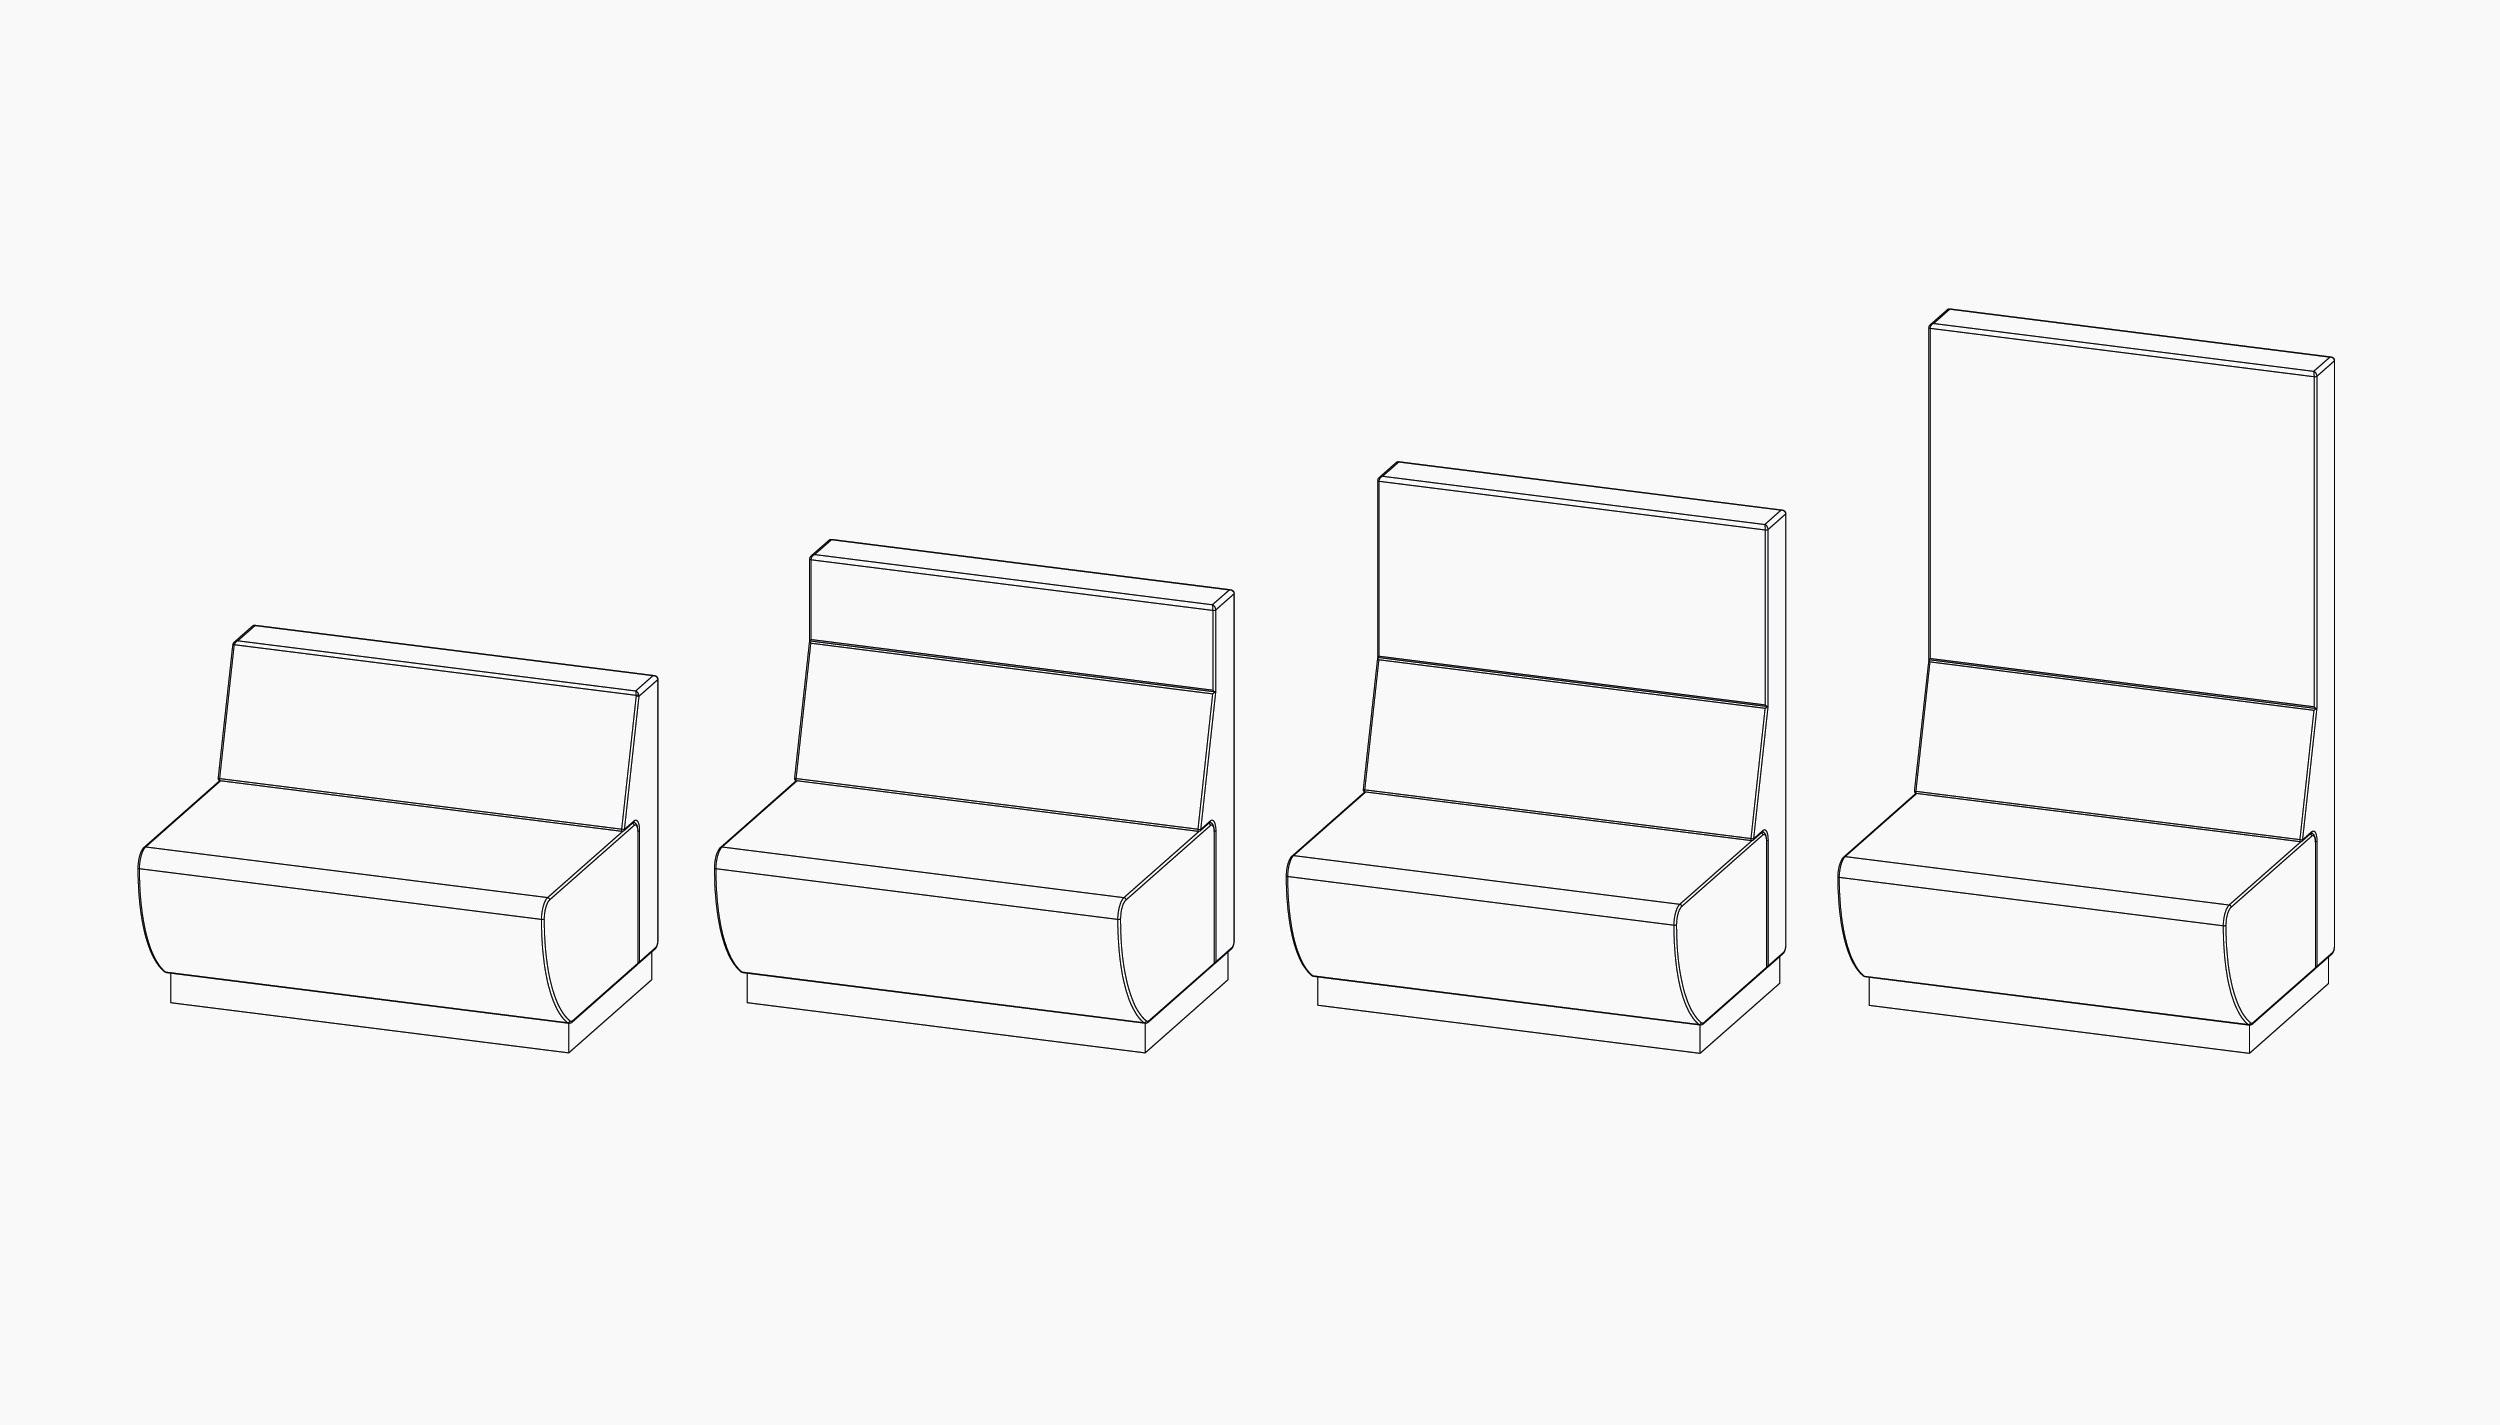 casala palau trainbench sofa lineart